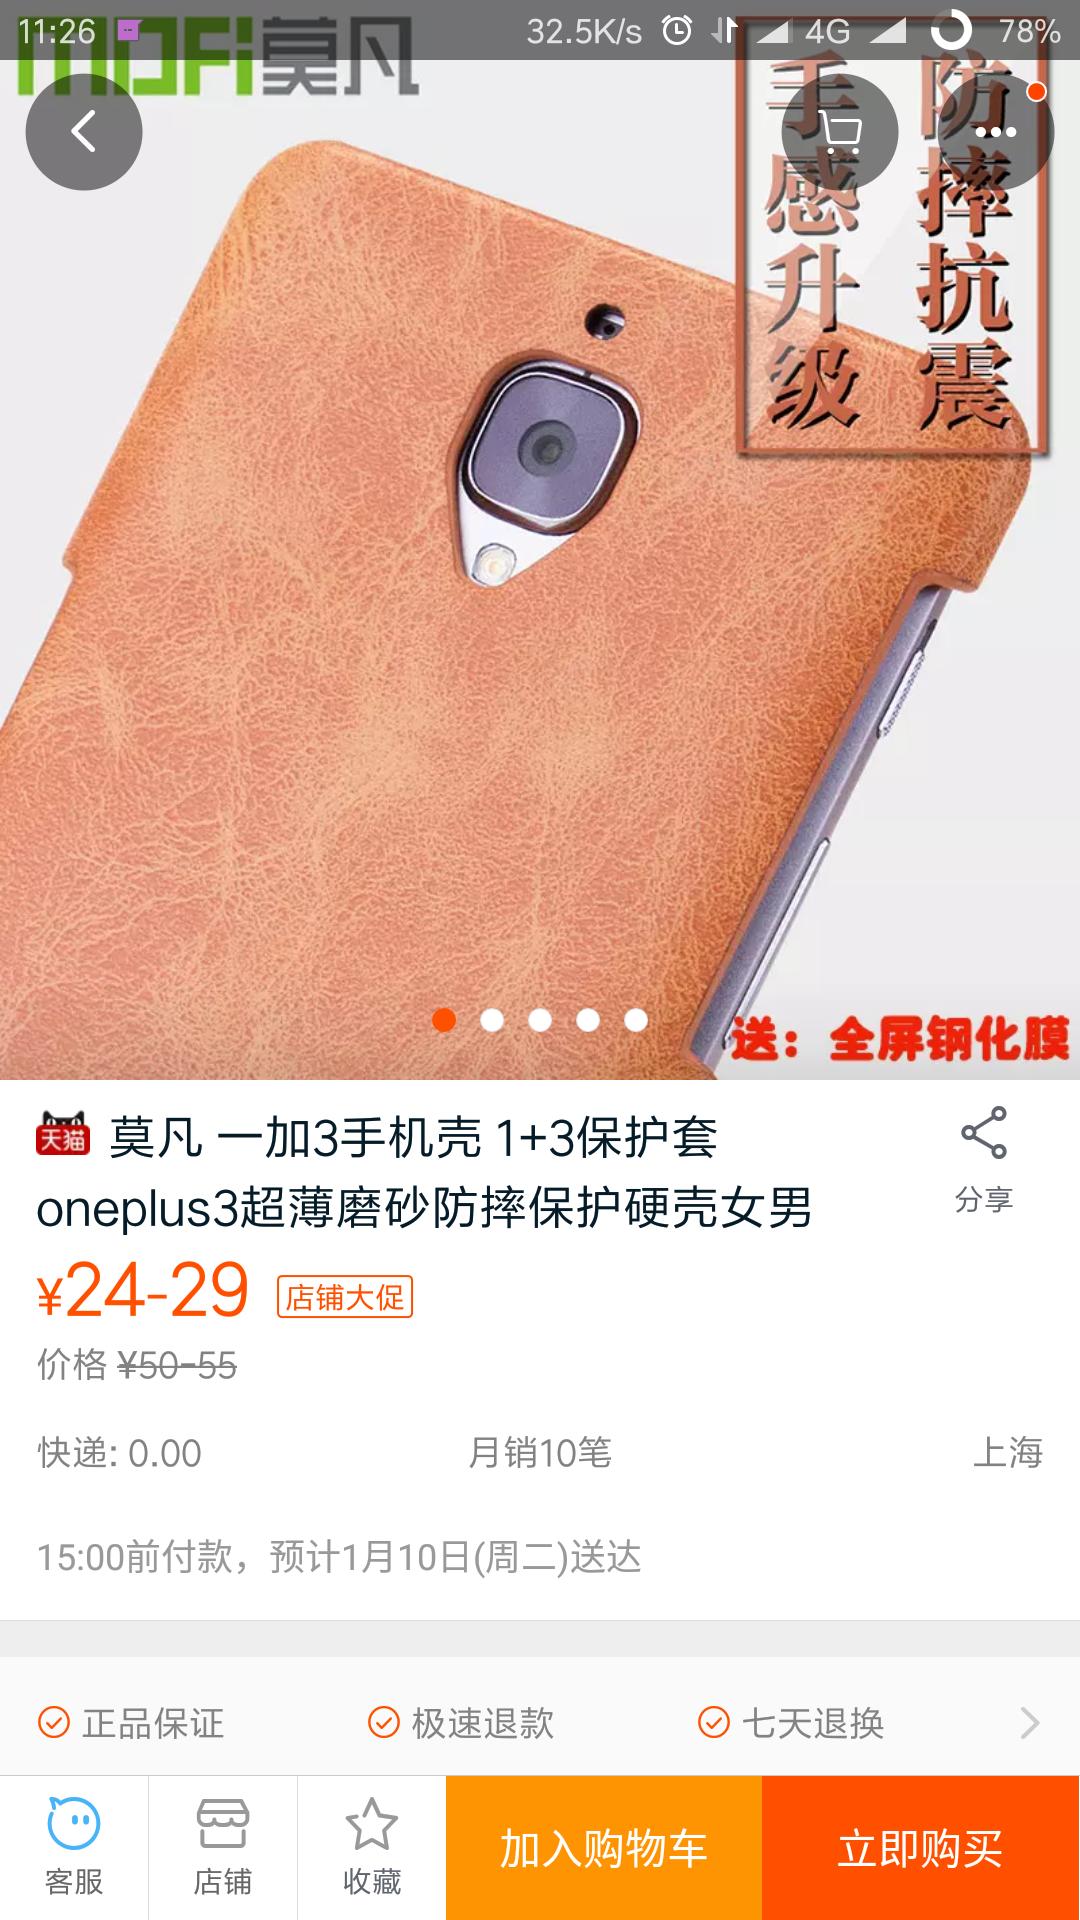 Screenshot_2017-01-07-11-26-02-255_com.taobao.taobao.png